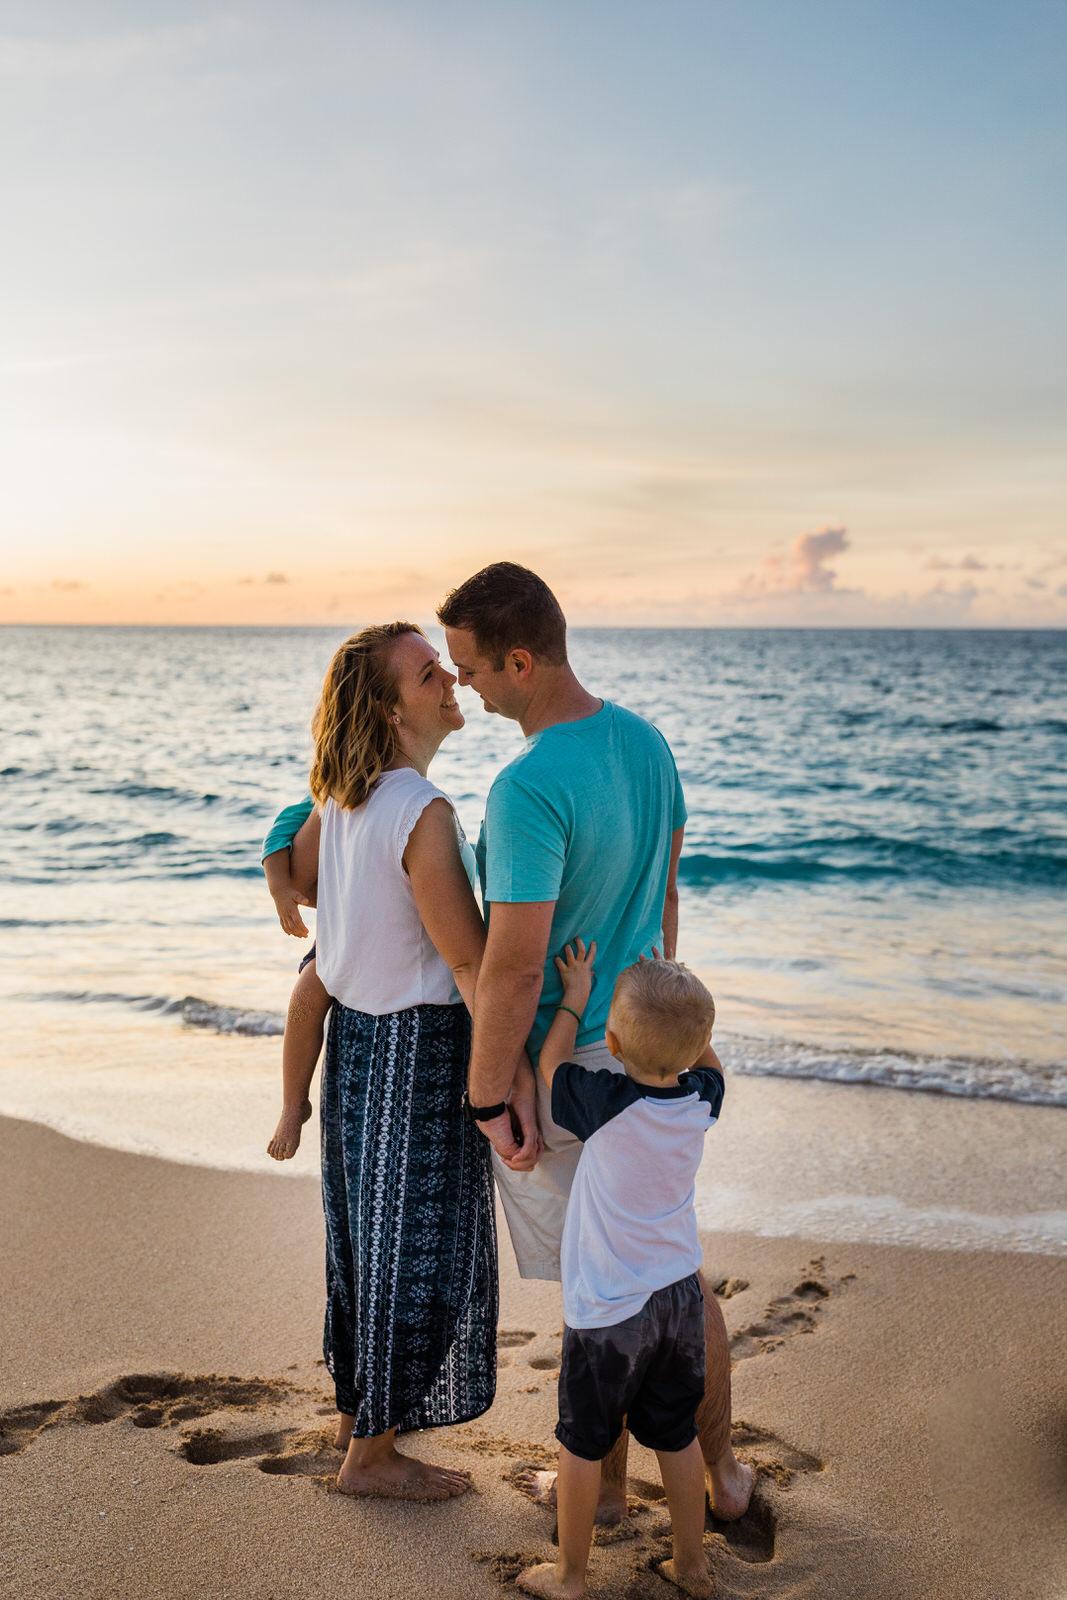 extended-family-big-island-vacation-cousins-grandparents-beach-waikoloa-sunset-hawaii-7259.jpg